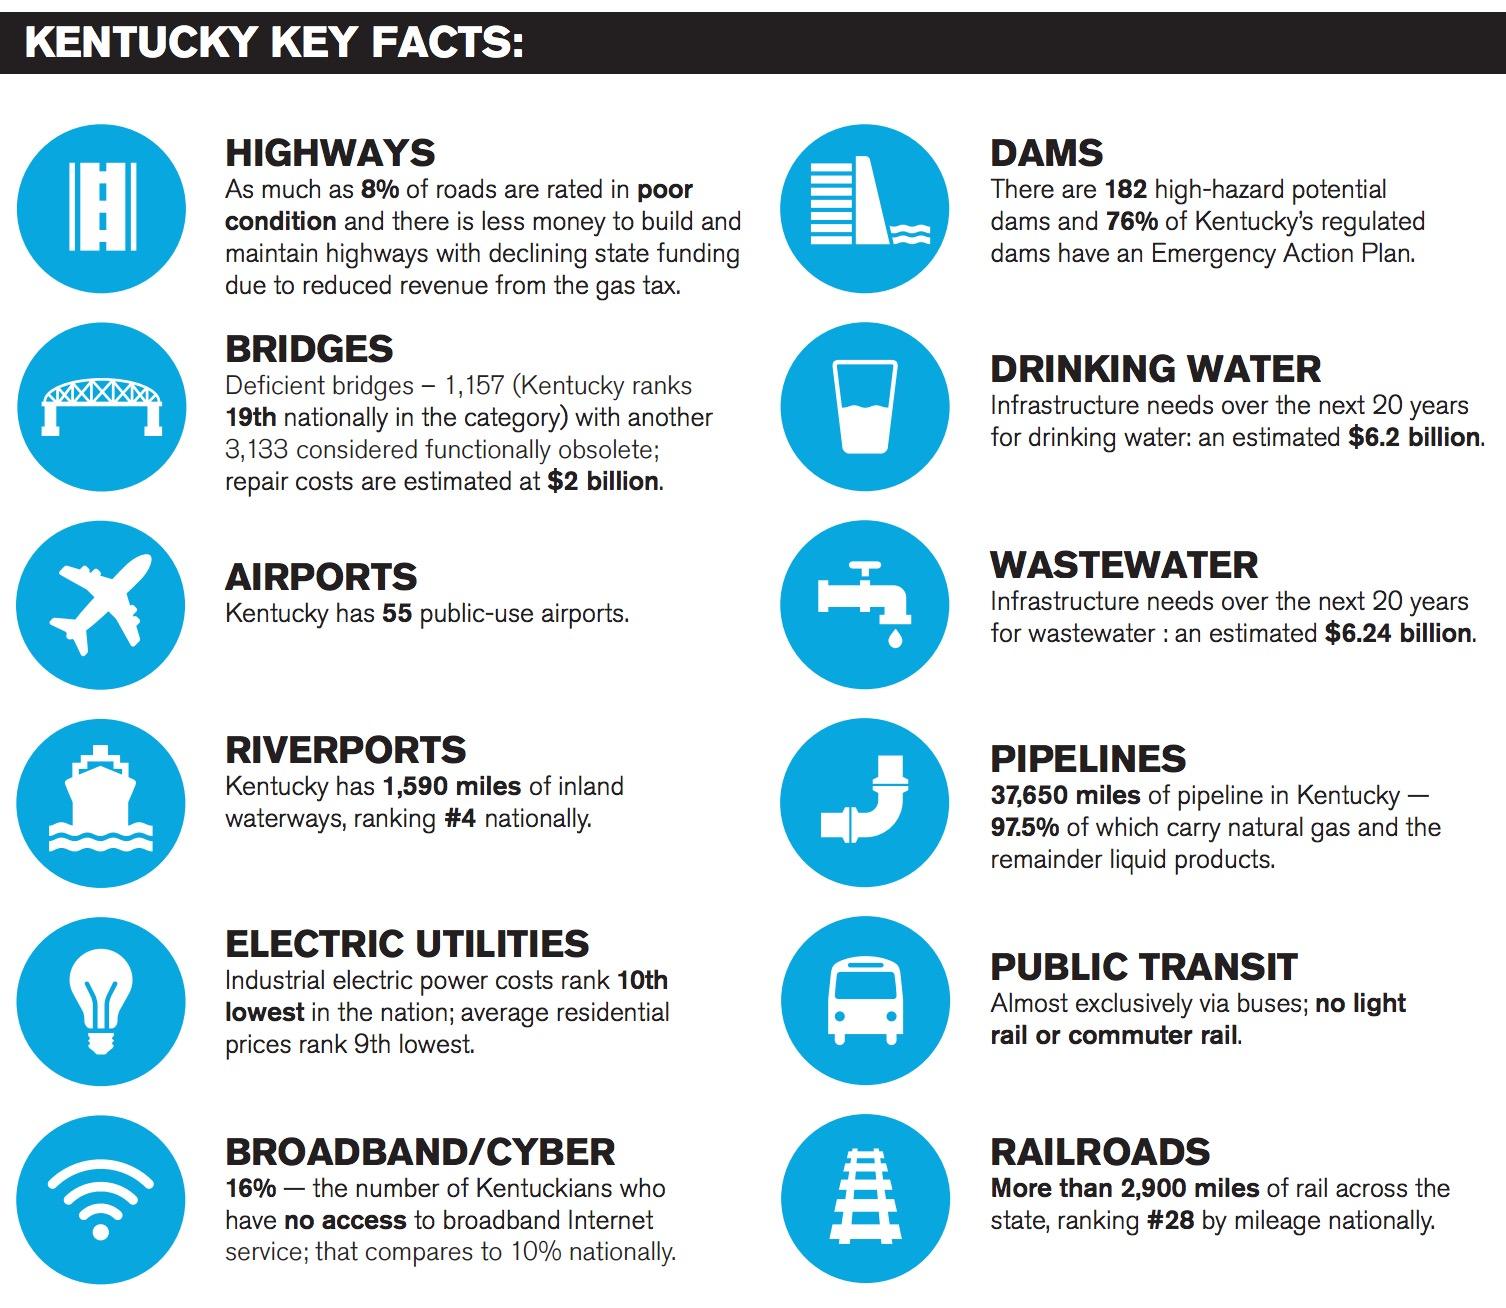 Kentucky Key Facts